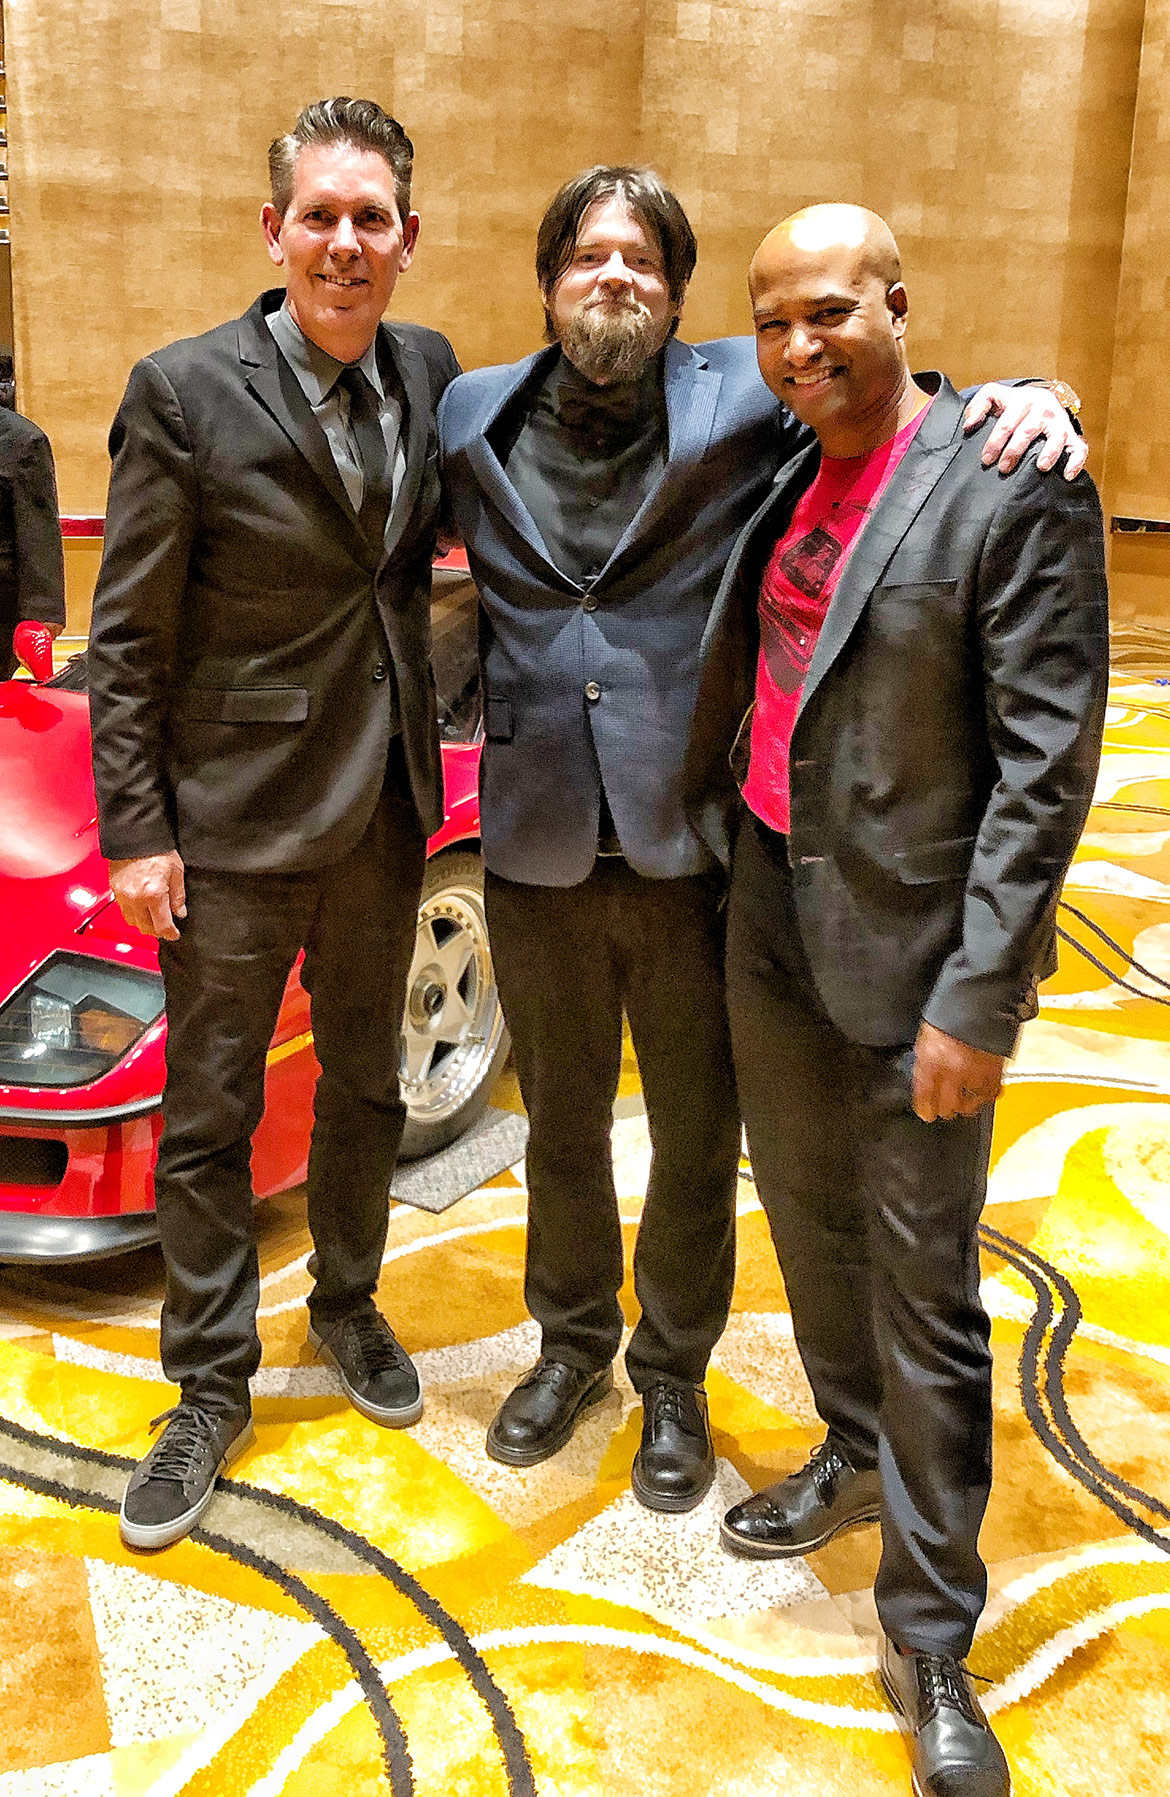 Three men standing together